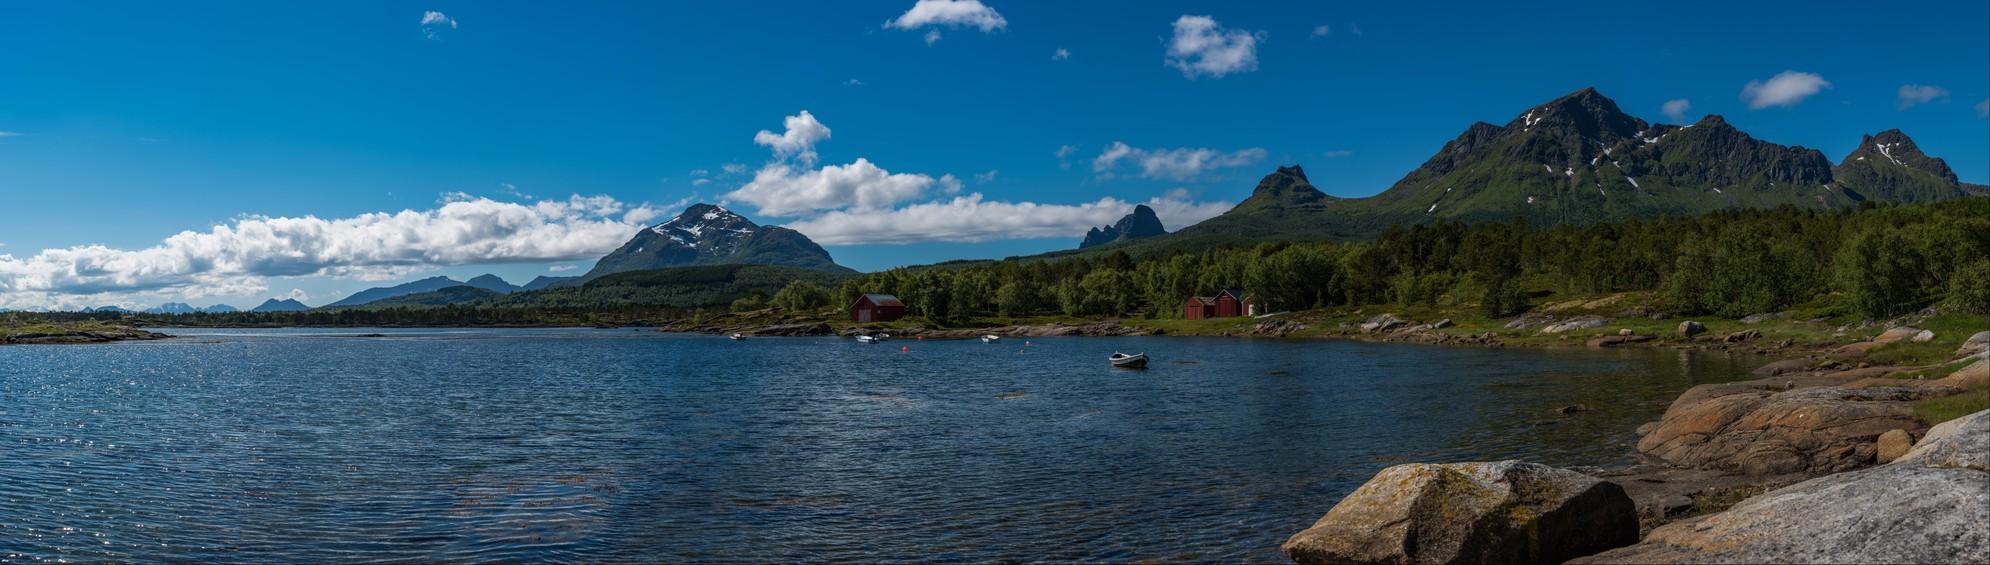 Lilandsjyen in Hamarøy (Norway)